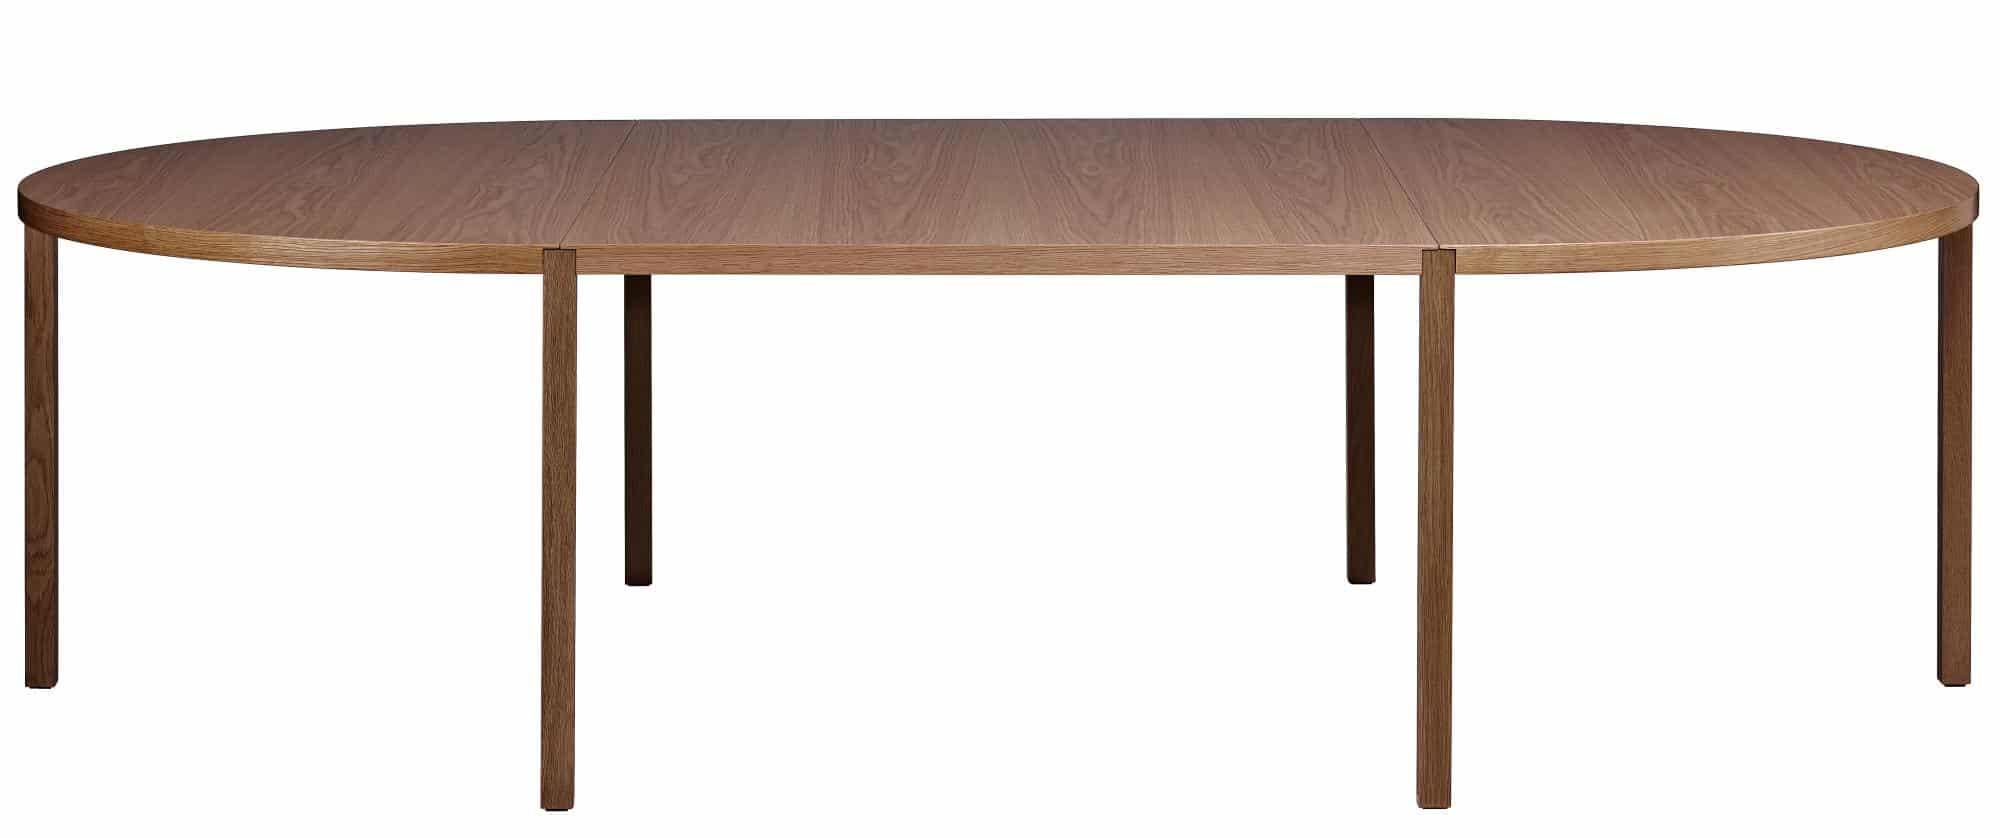 Bespoke u2013 Swedese Scandinavian Design